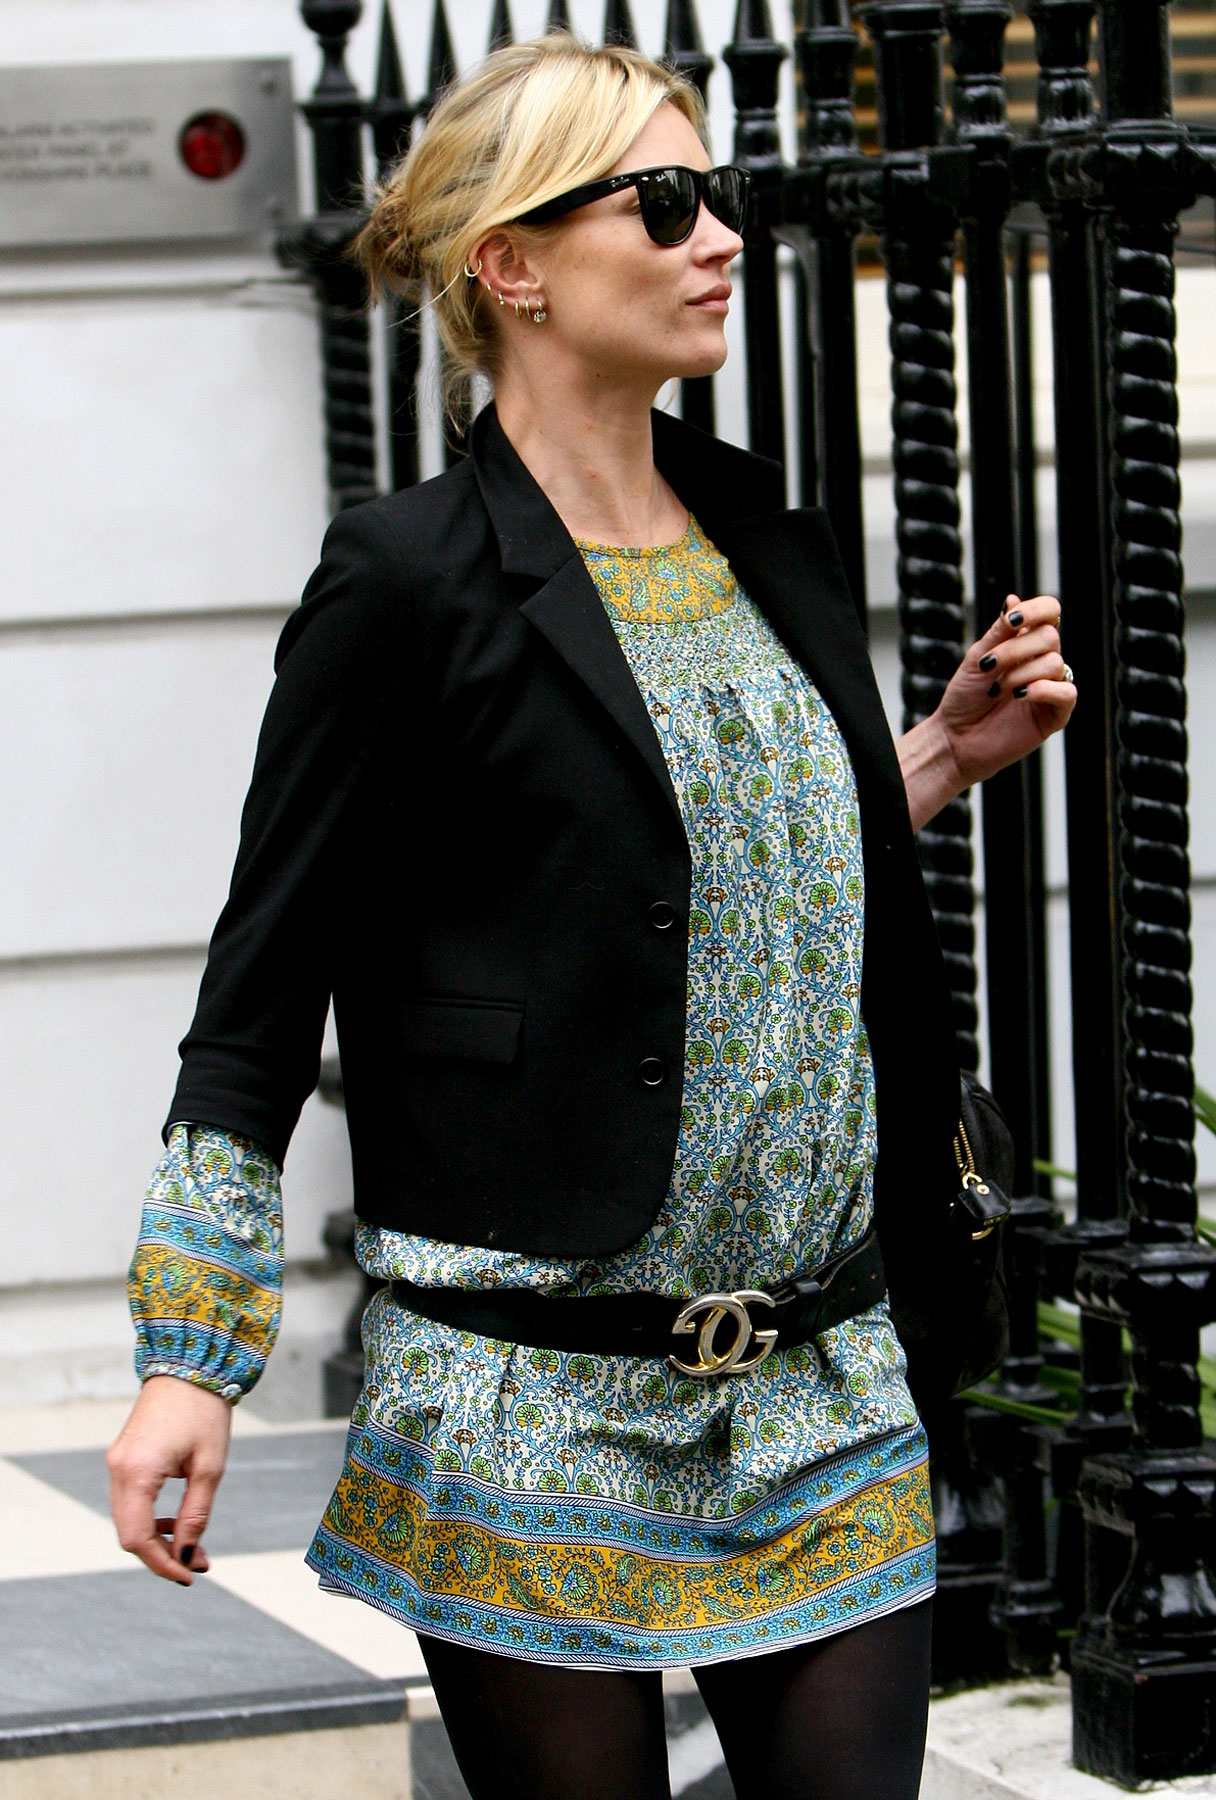 Kate Moss: Billowy Not Bumpy